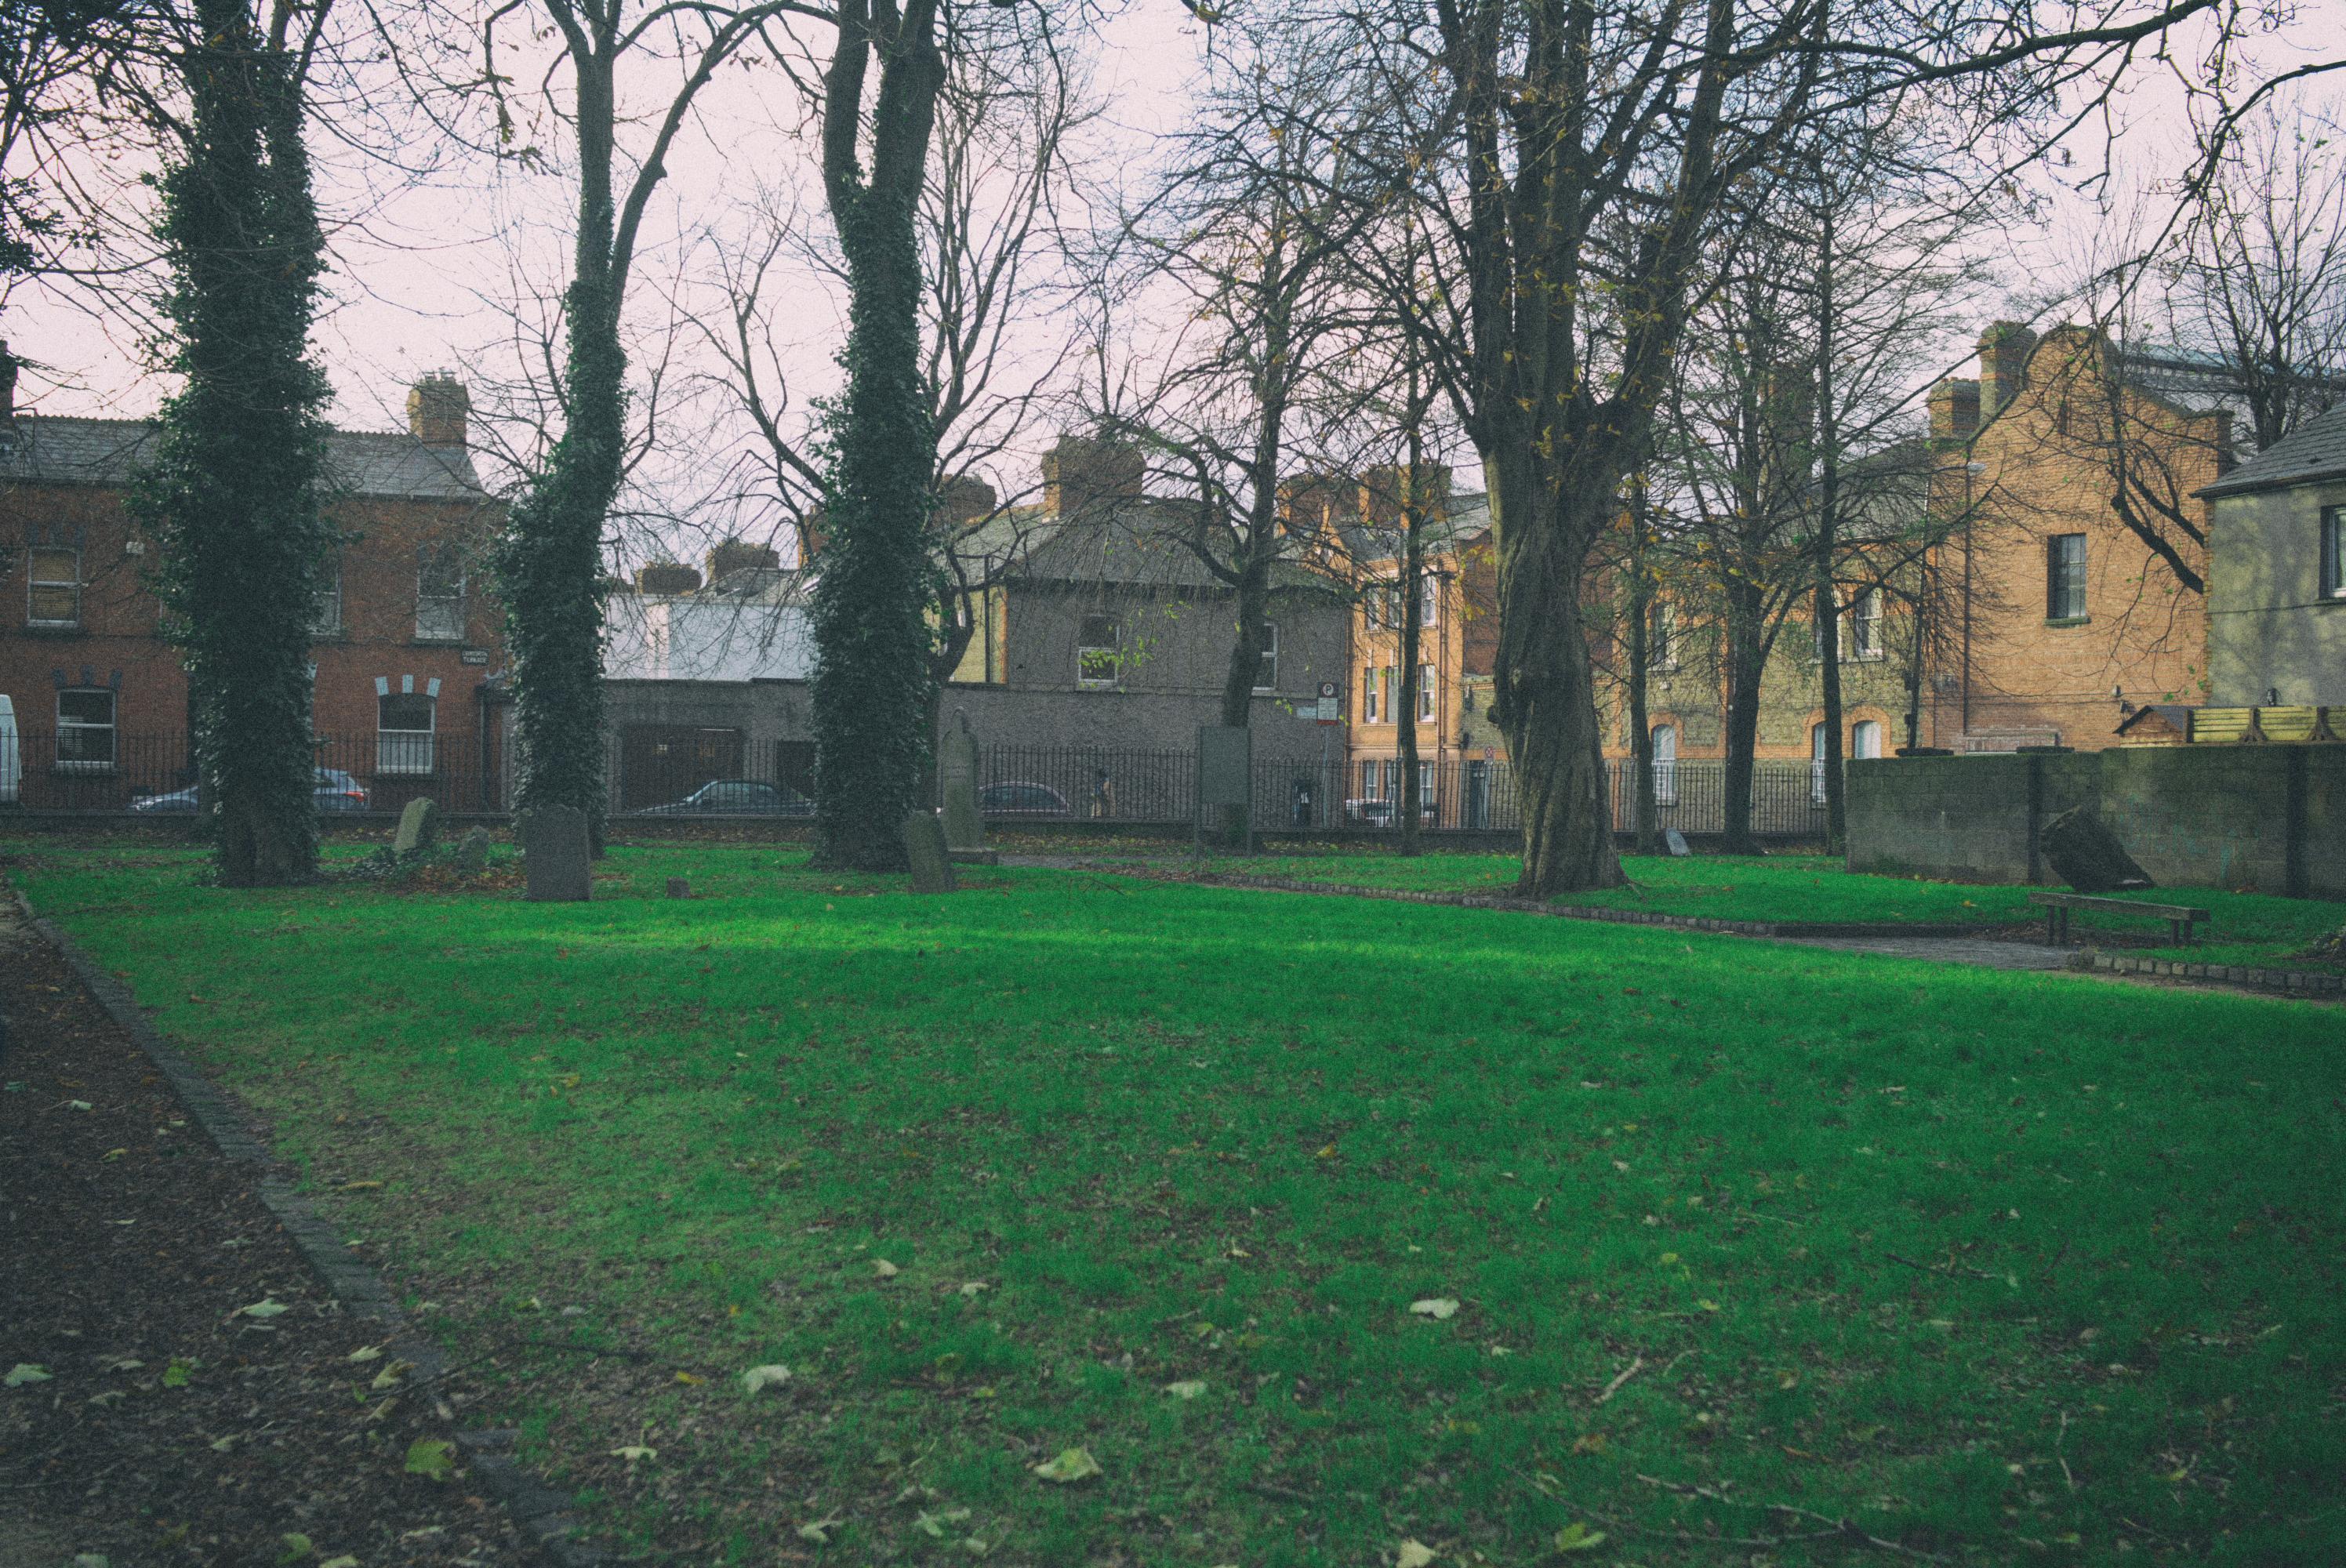 St. Catherine's Park